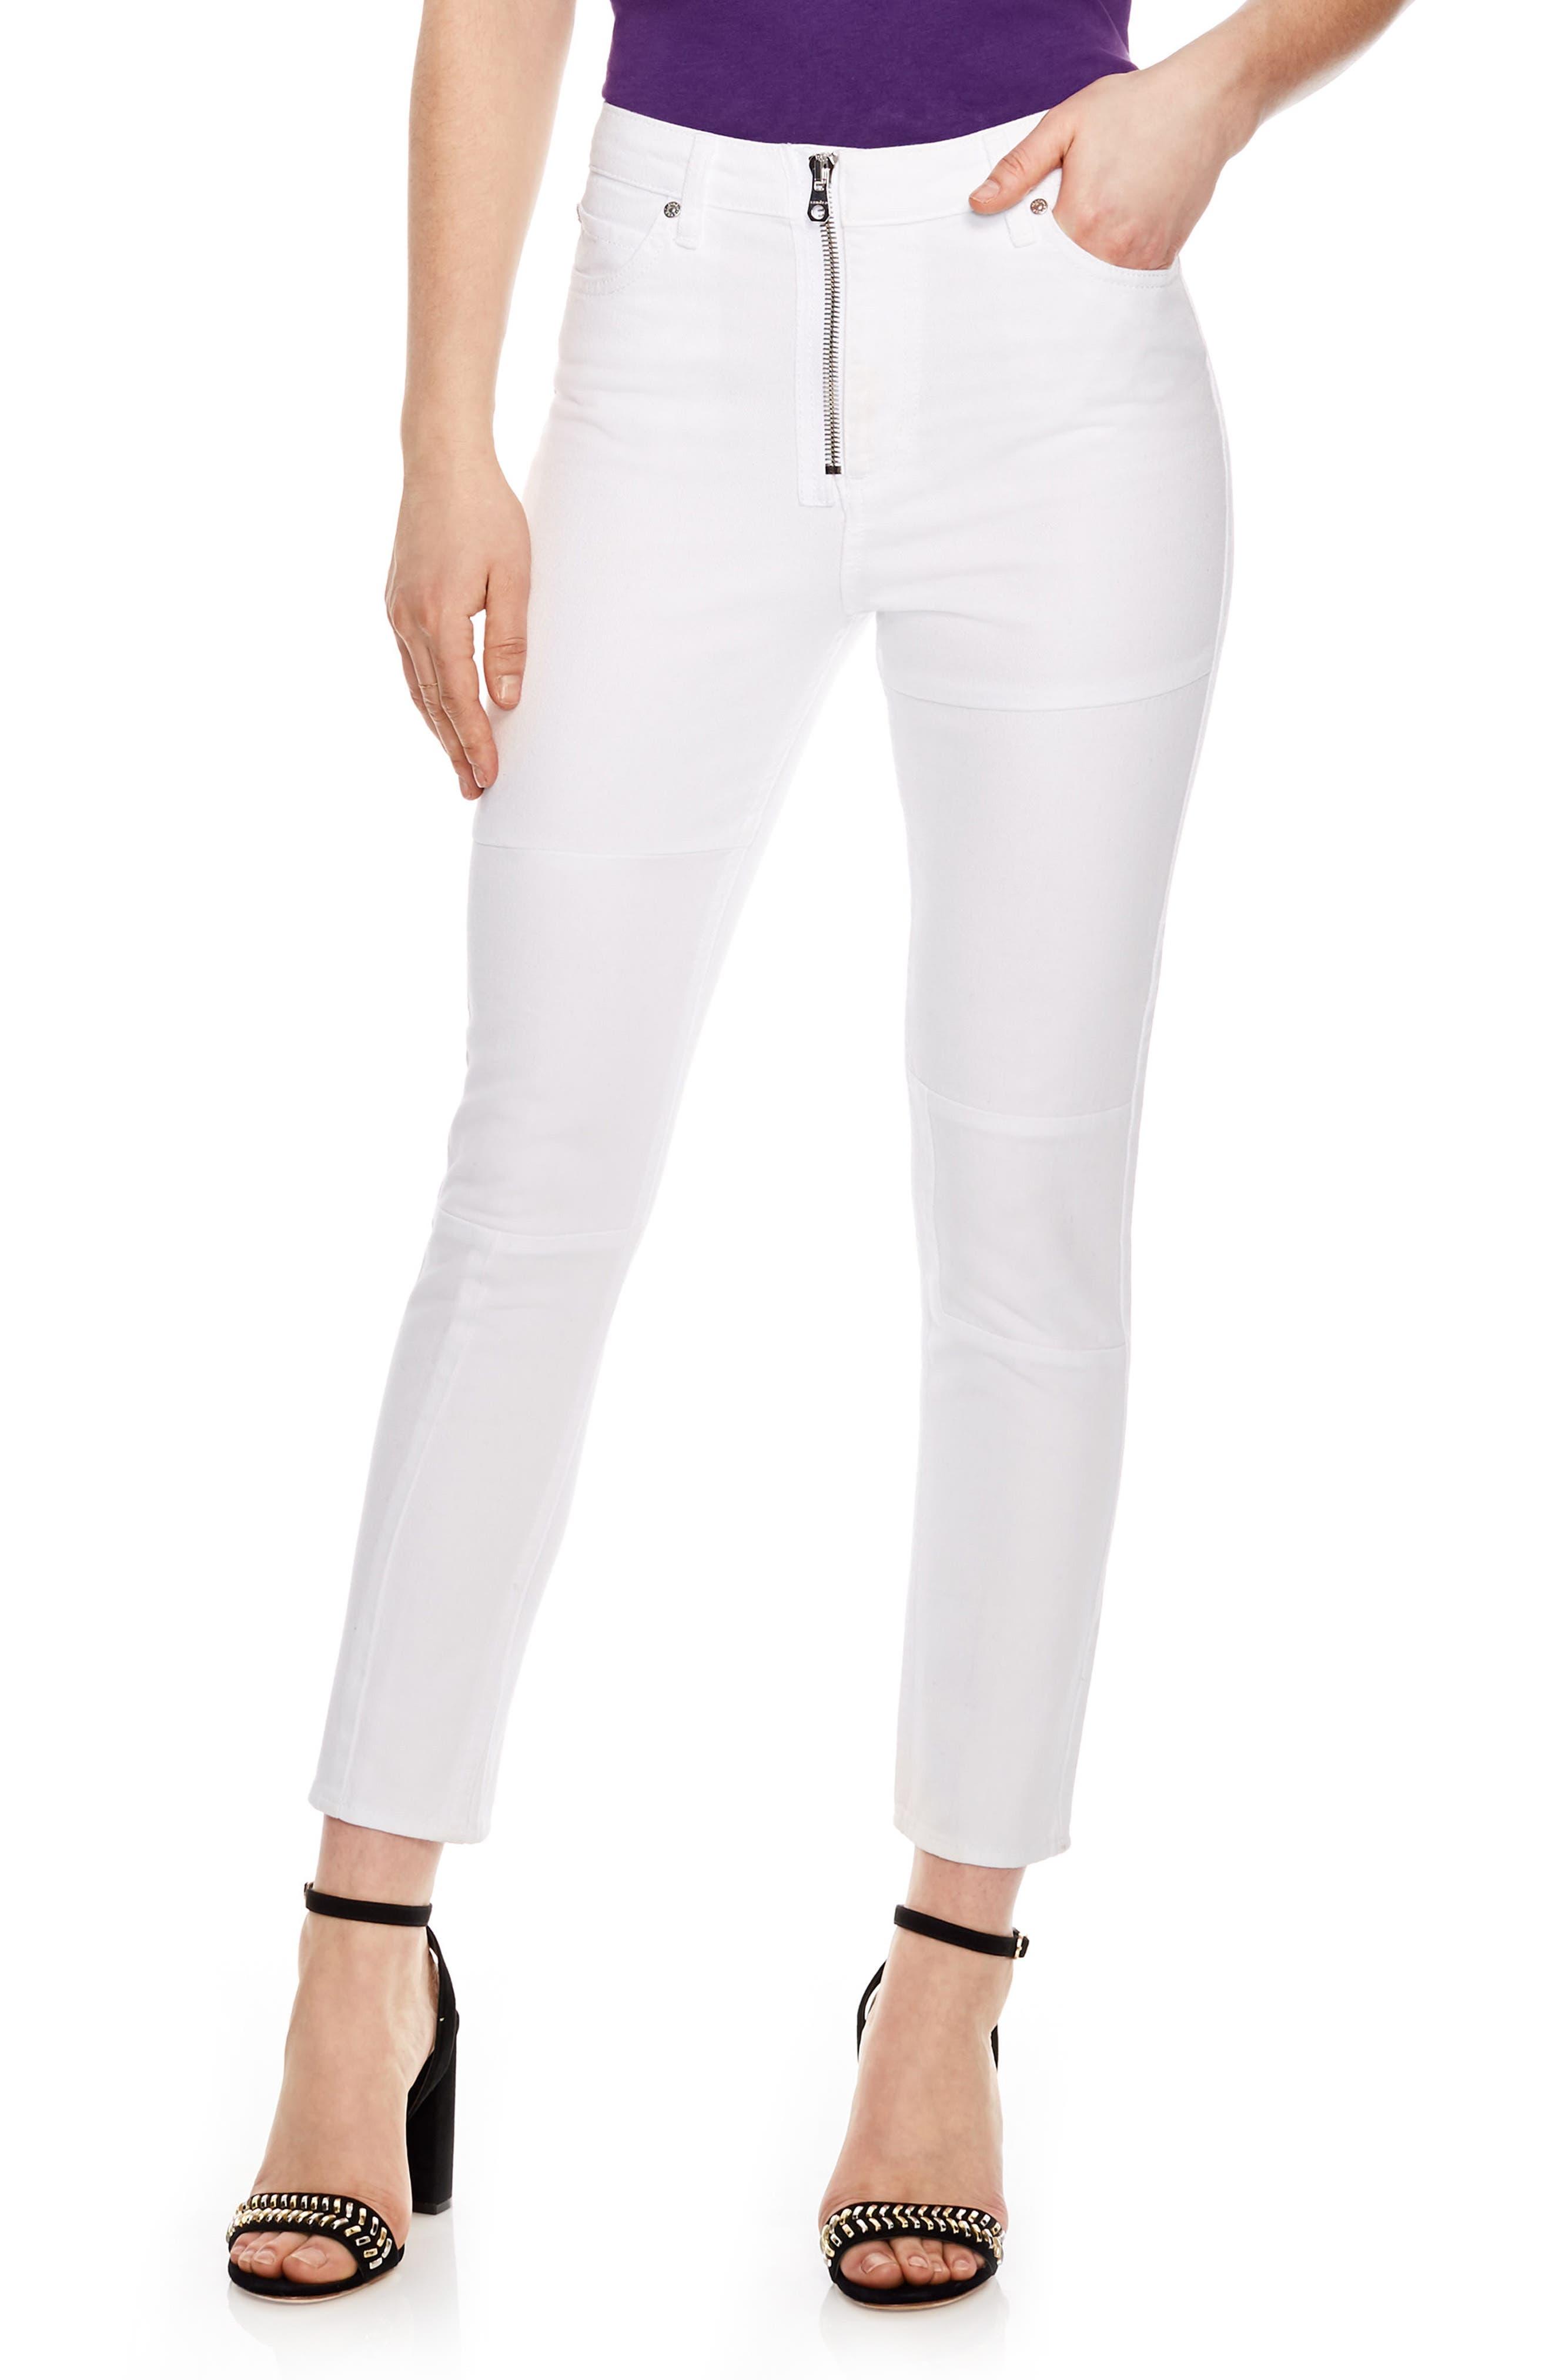 Blanc White Zip Jeans,                             Main thumbnail 1, color,                             White